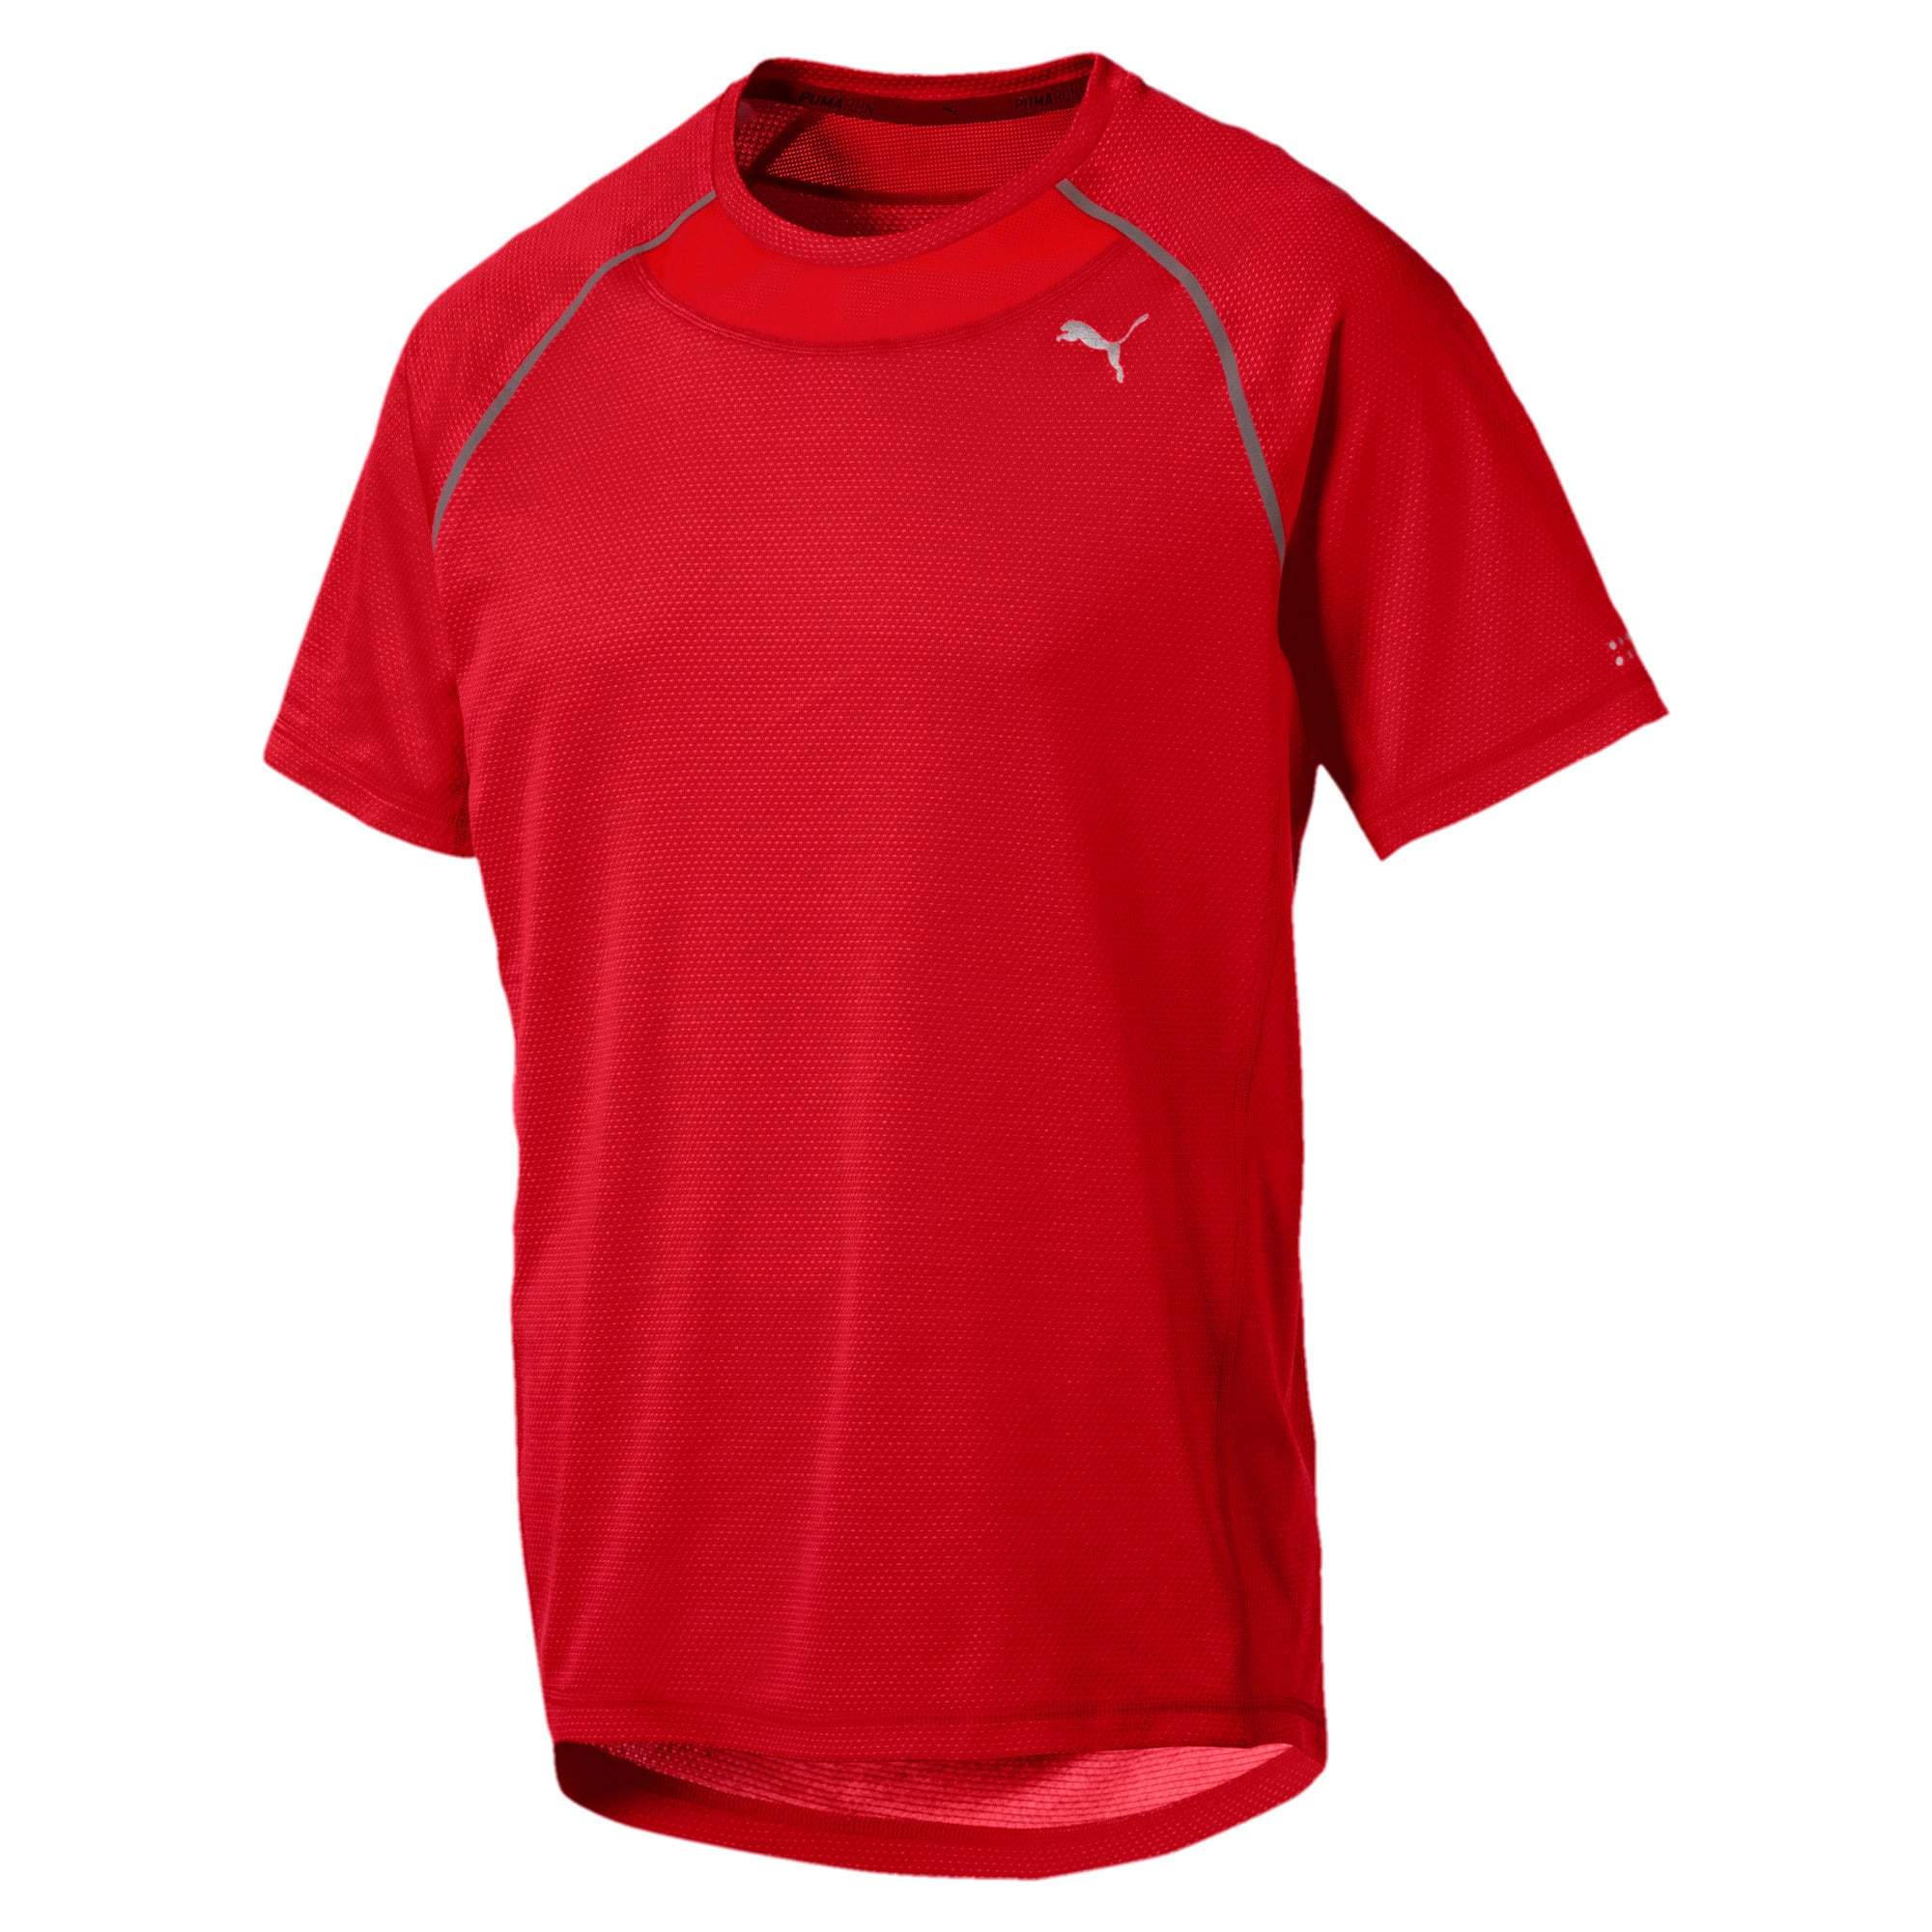 Thumbnail 1 of PWRRUN AdapThermo-R Men's Short Sleeve Running T-Shirt, Flame Scarlet, medium-IND